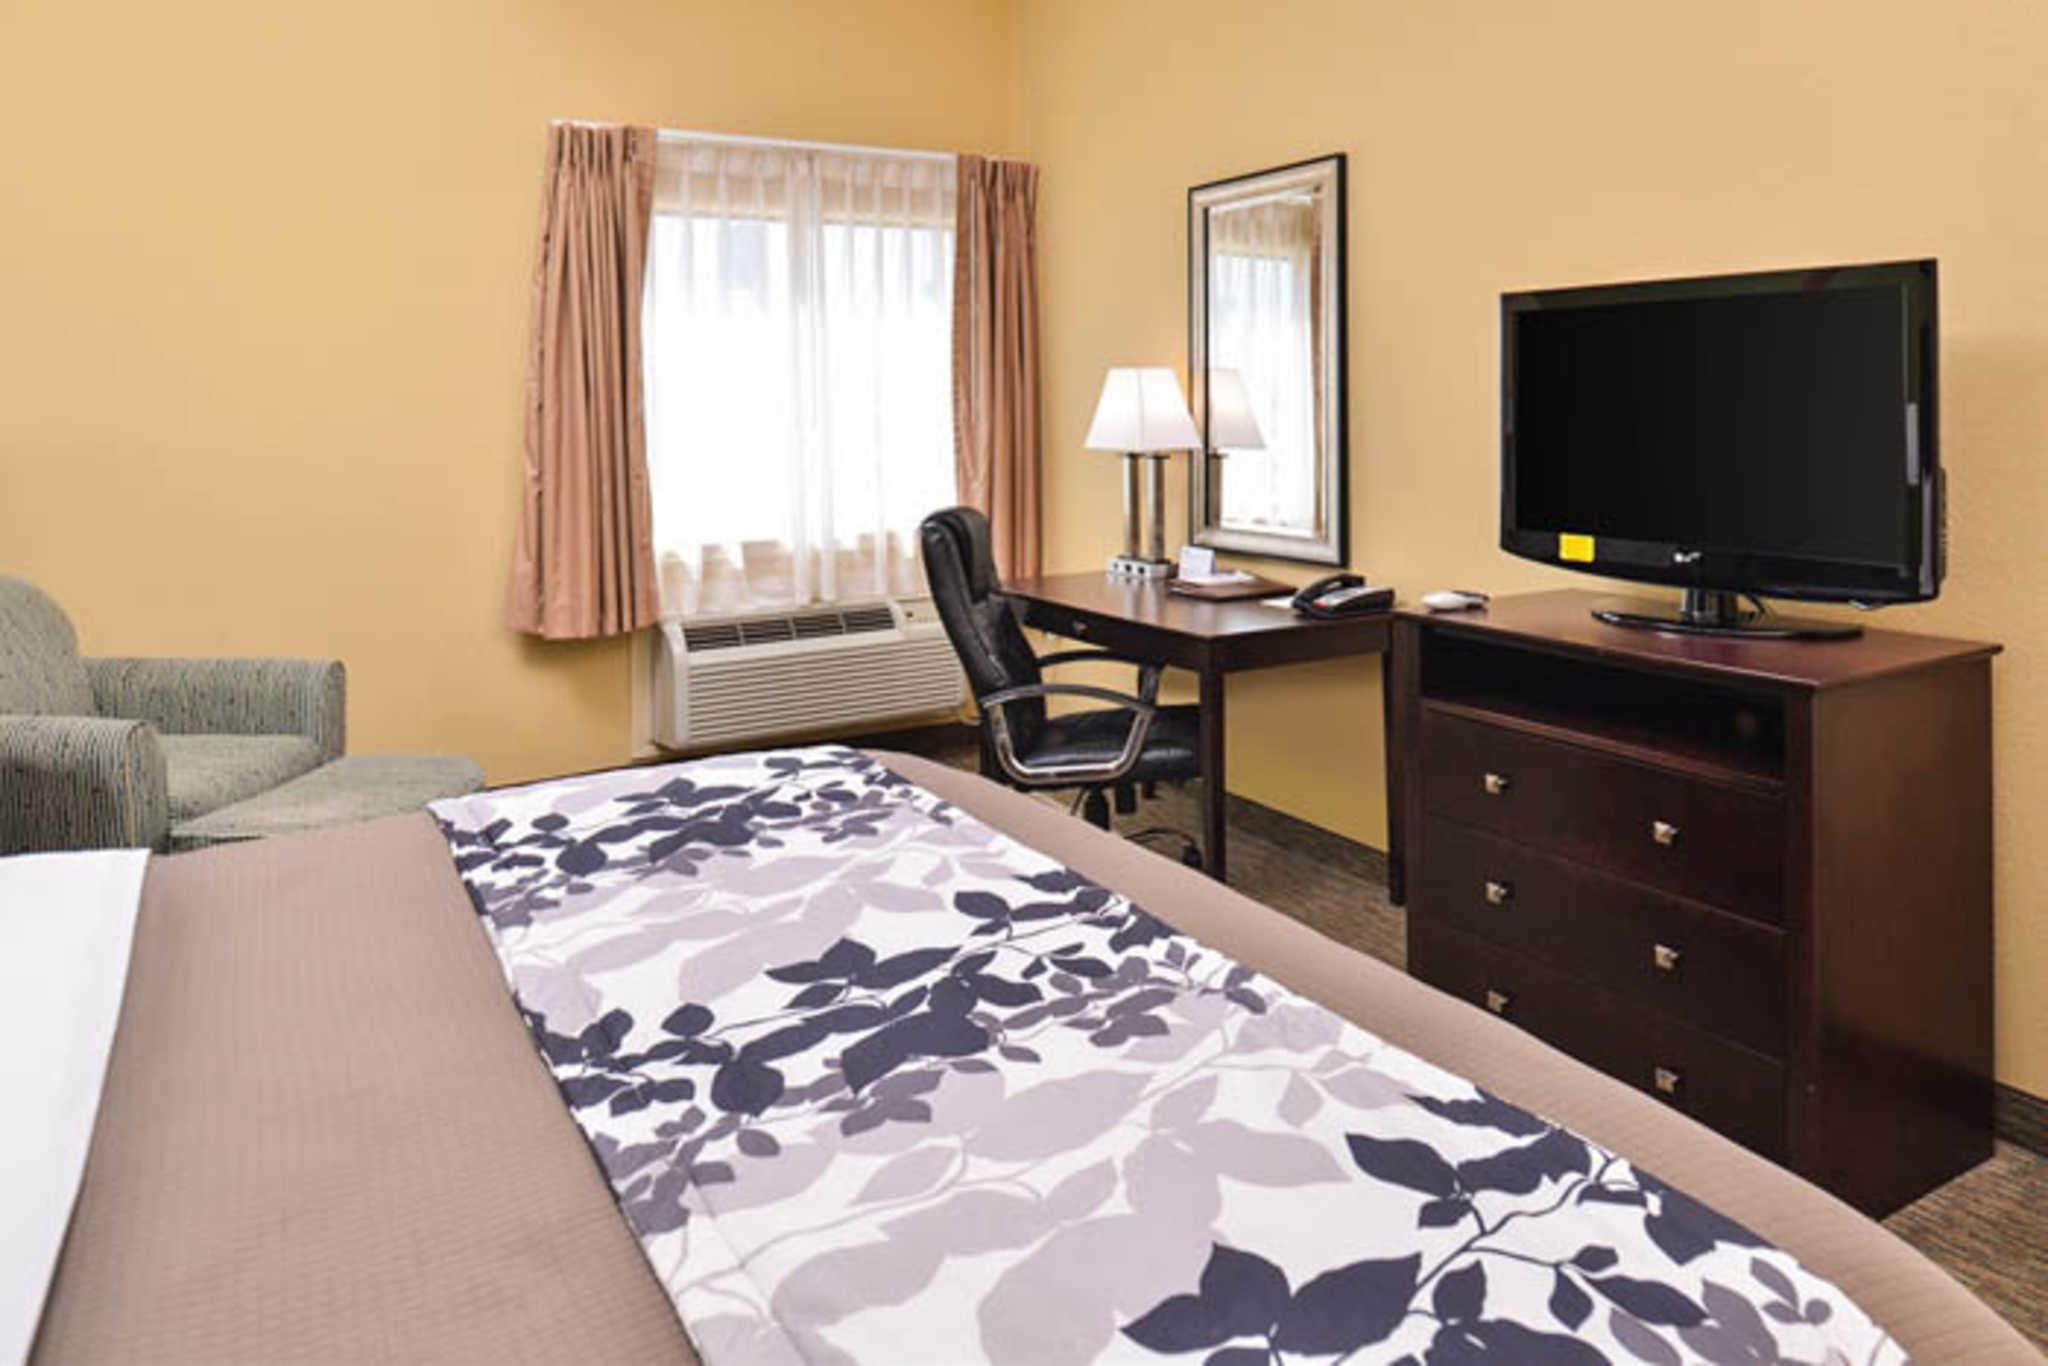 Sleep Inn & Suites Near Downtown North image 11